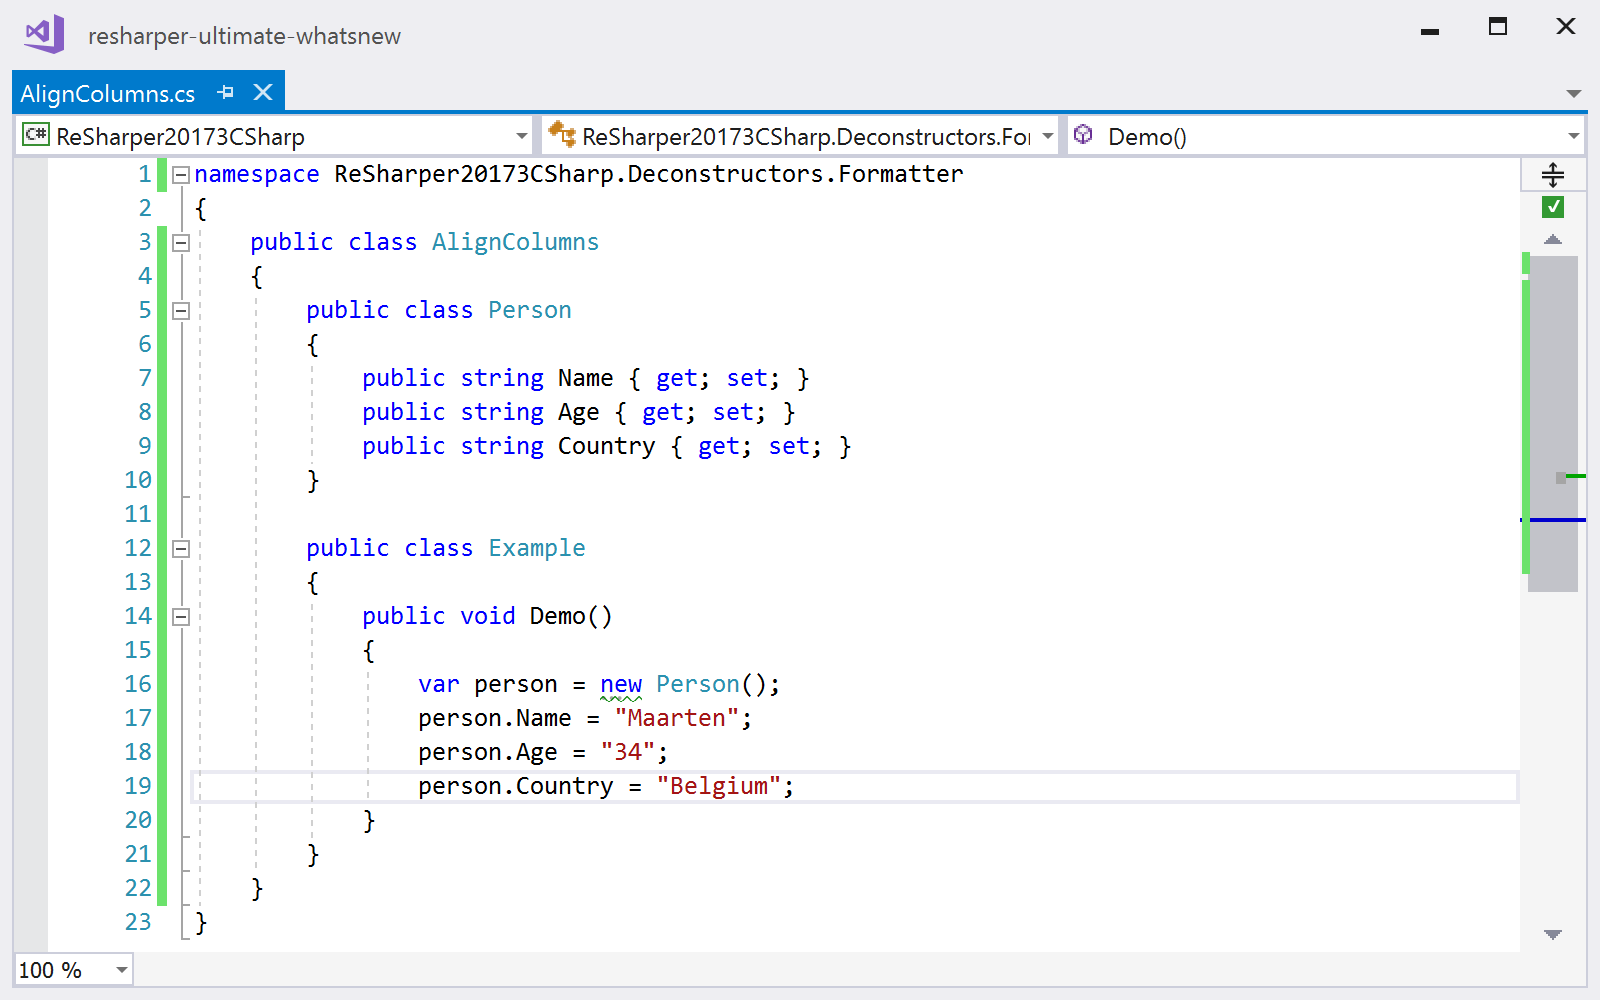 Reformat code in columns